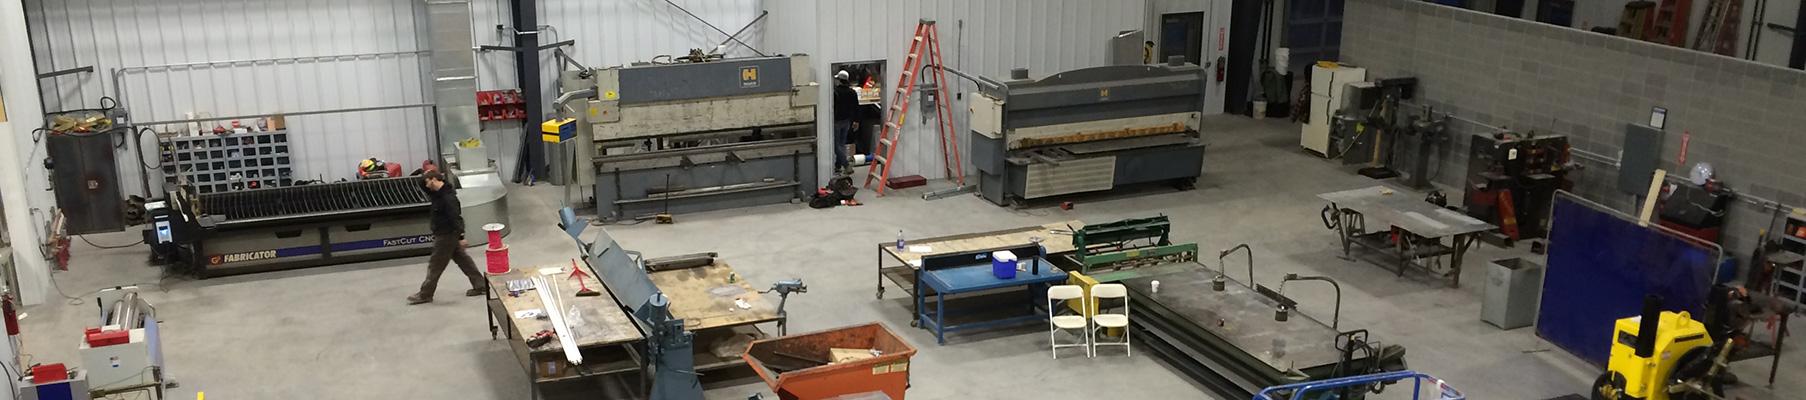 AGS Mechanical Contractors Ltd.